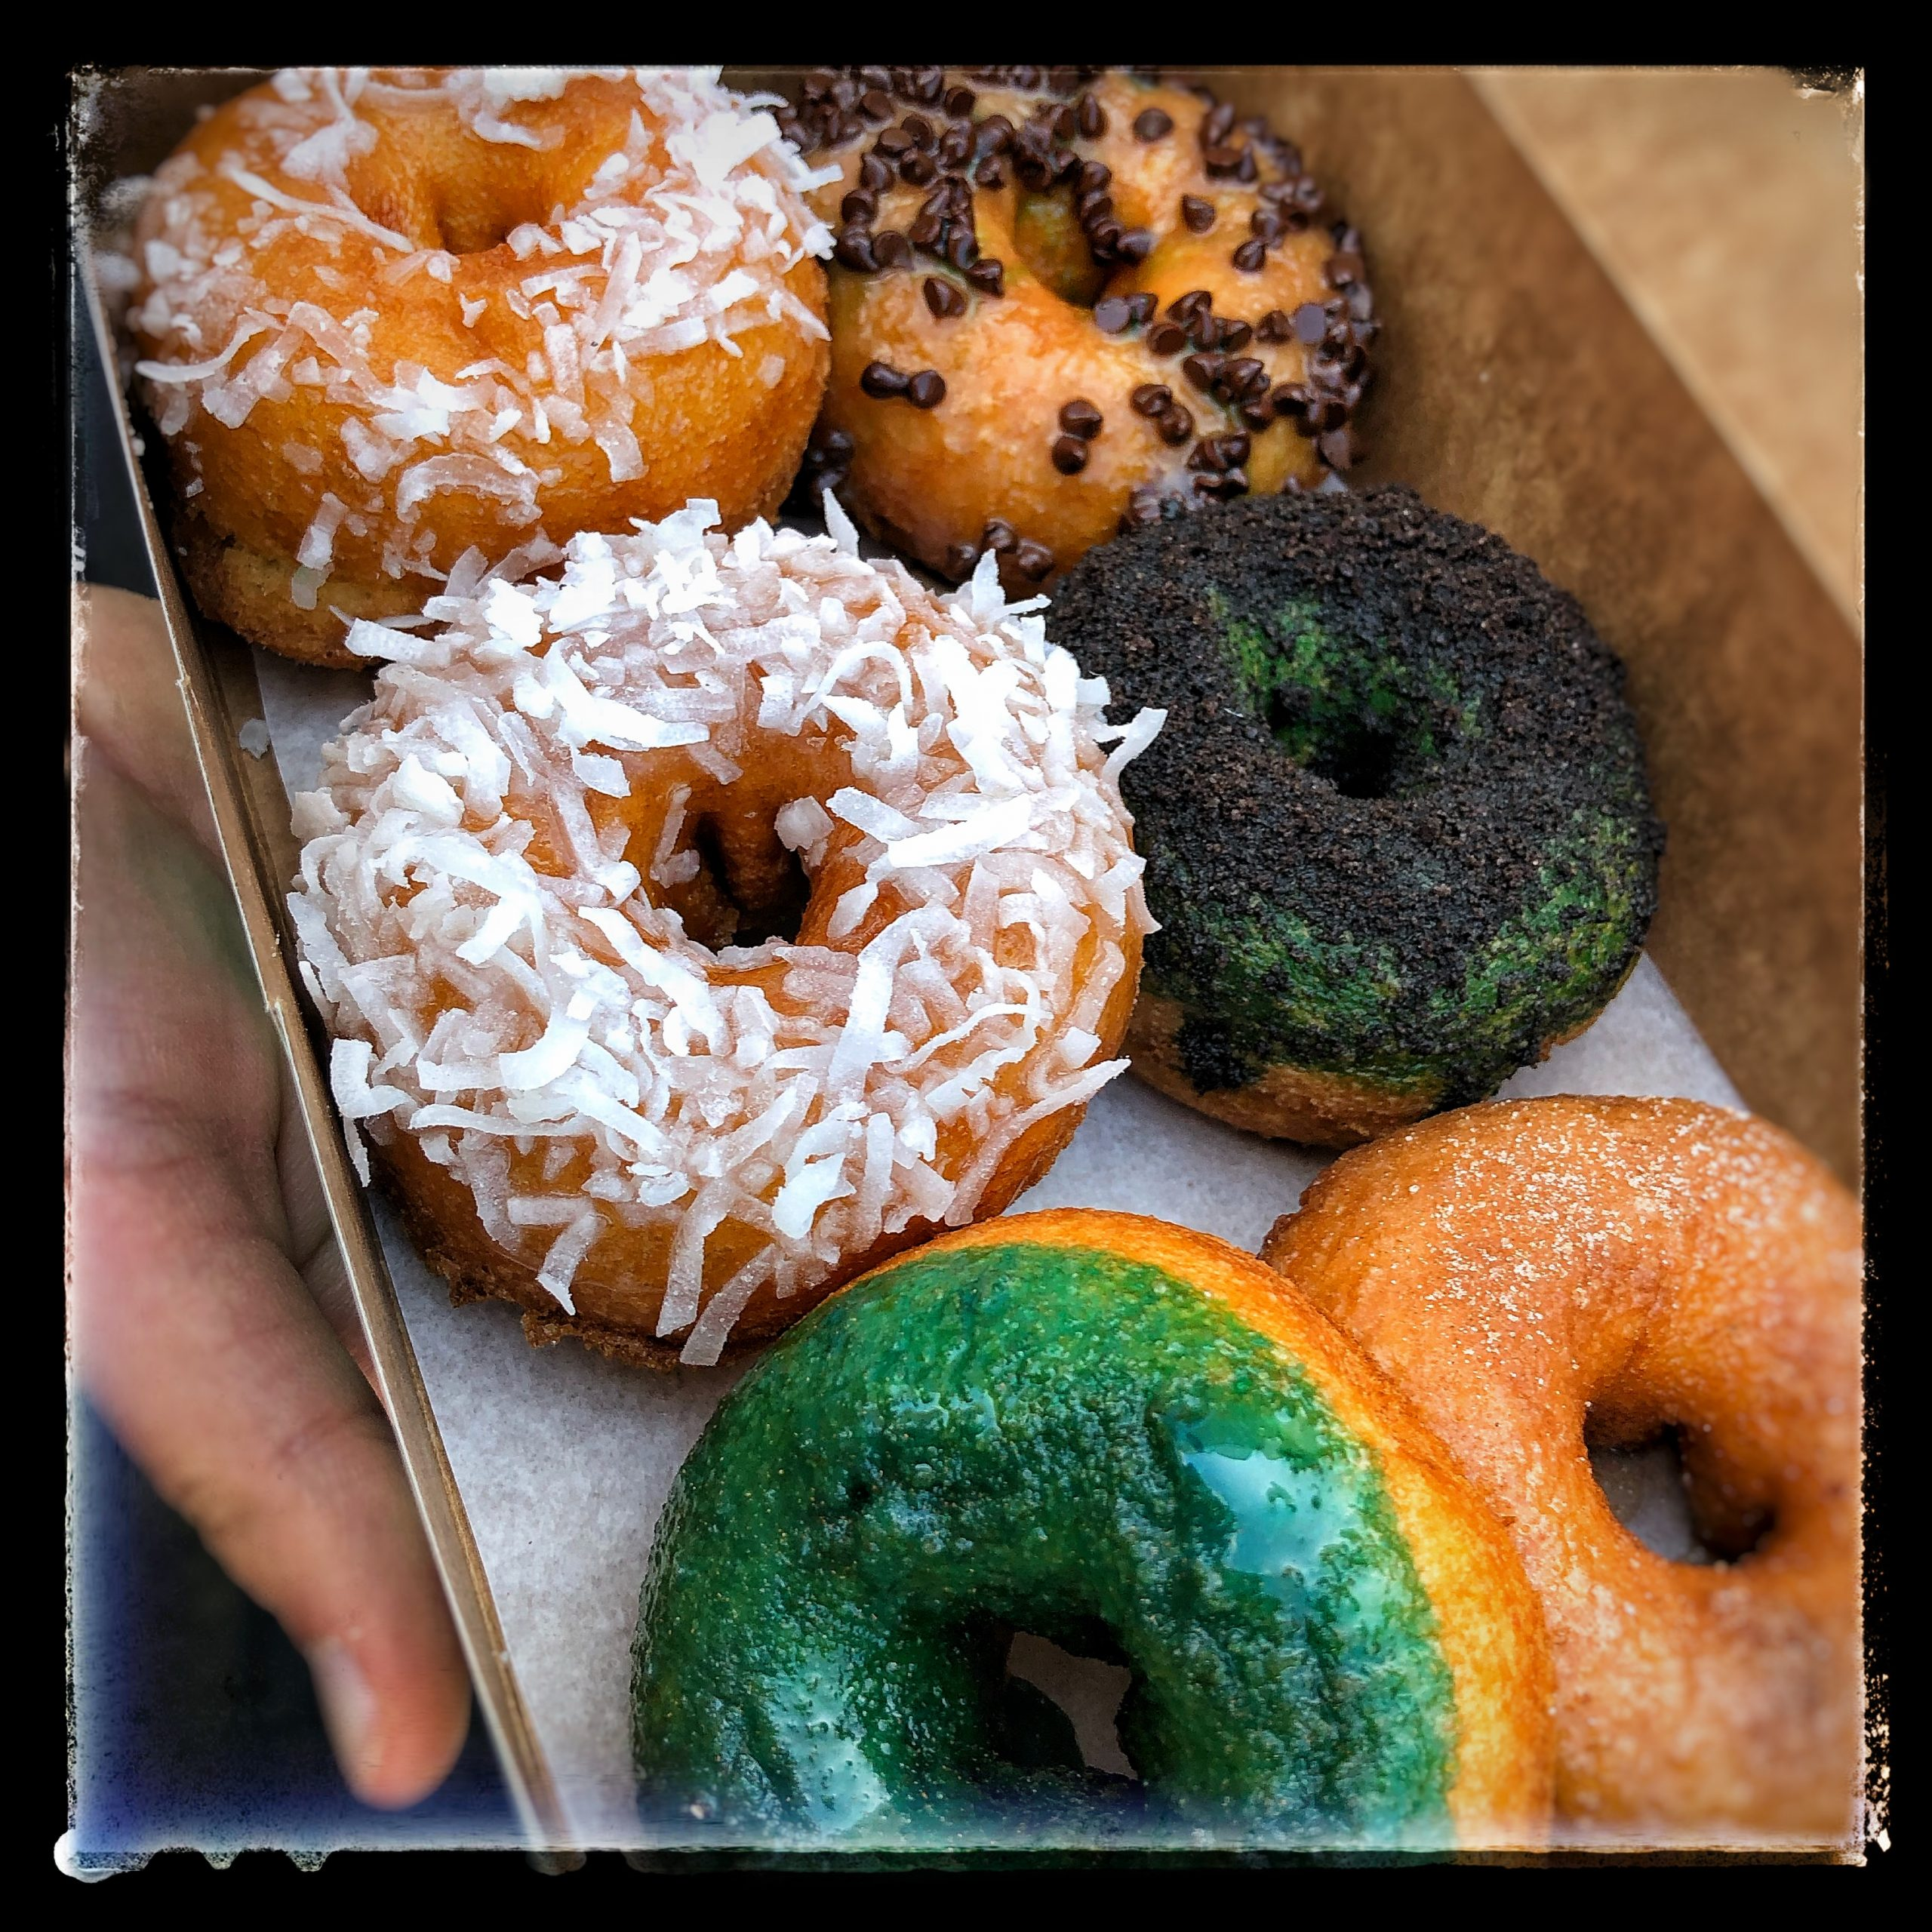 Sandy Pony Donuts - Chincoteague Island